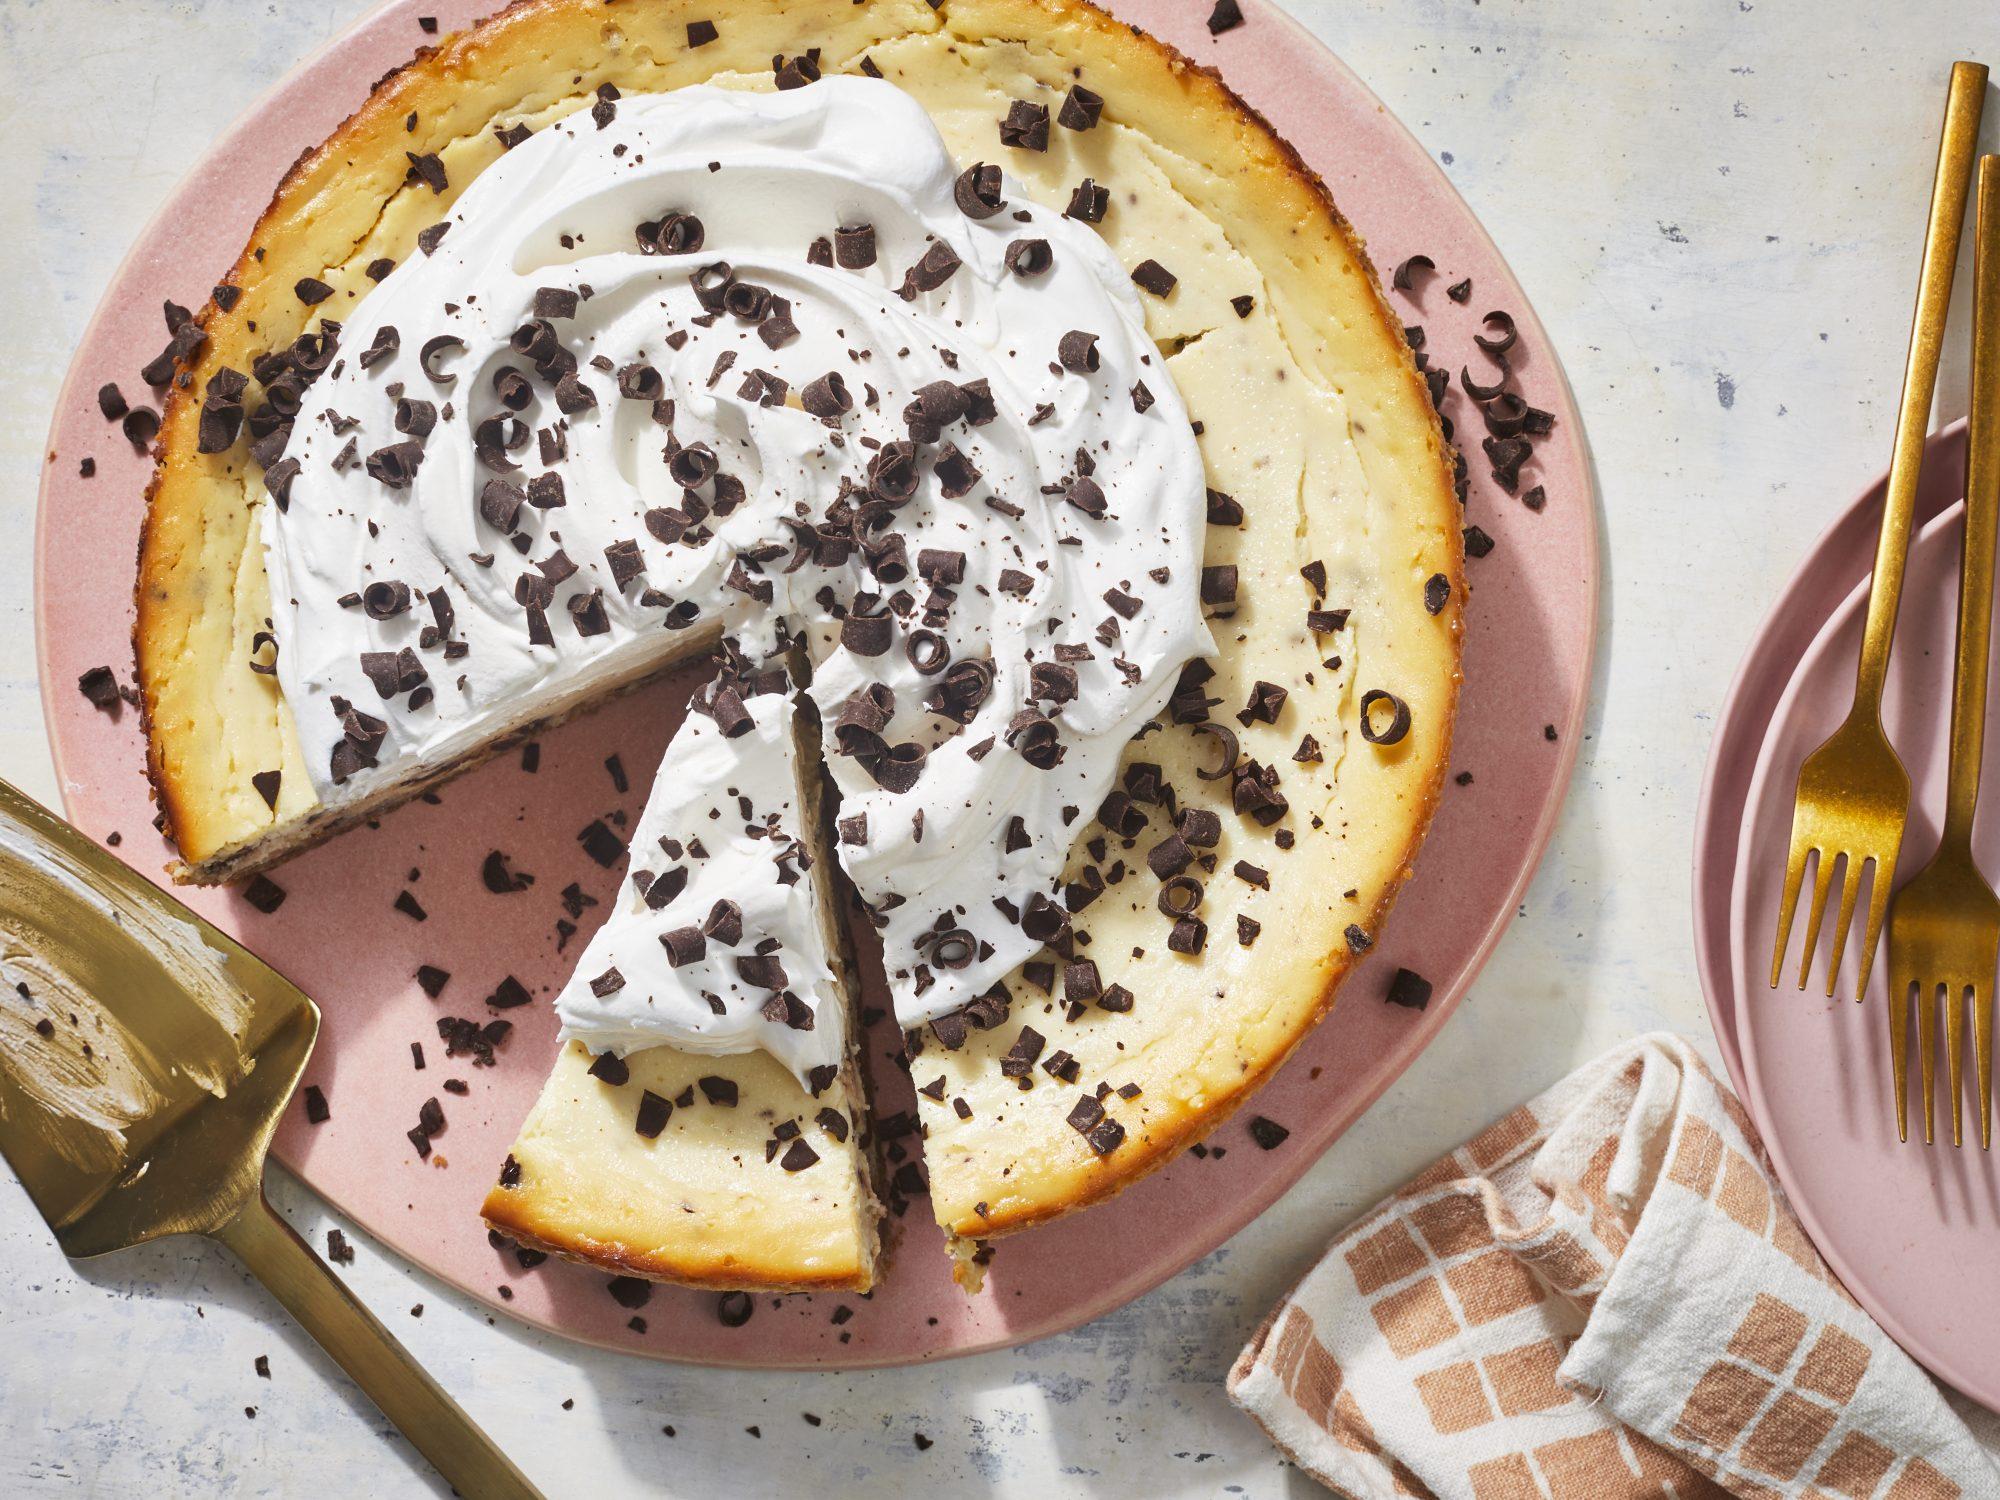 mr - Cannoli Cheesecake Image